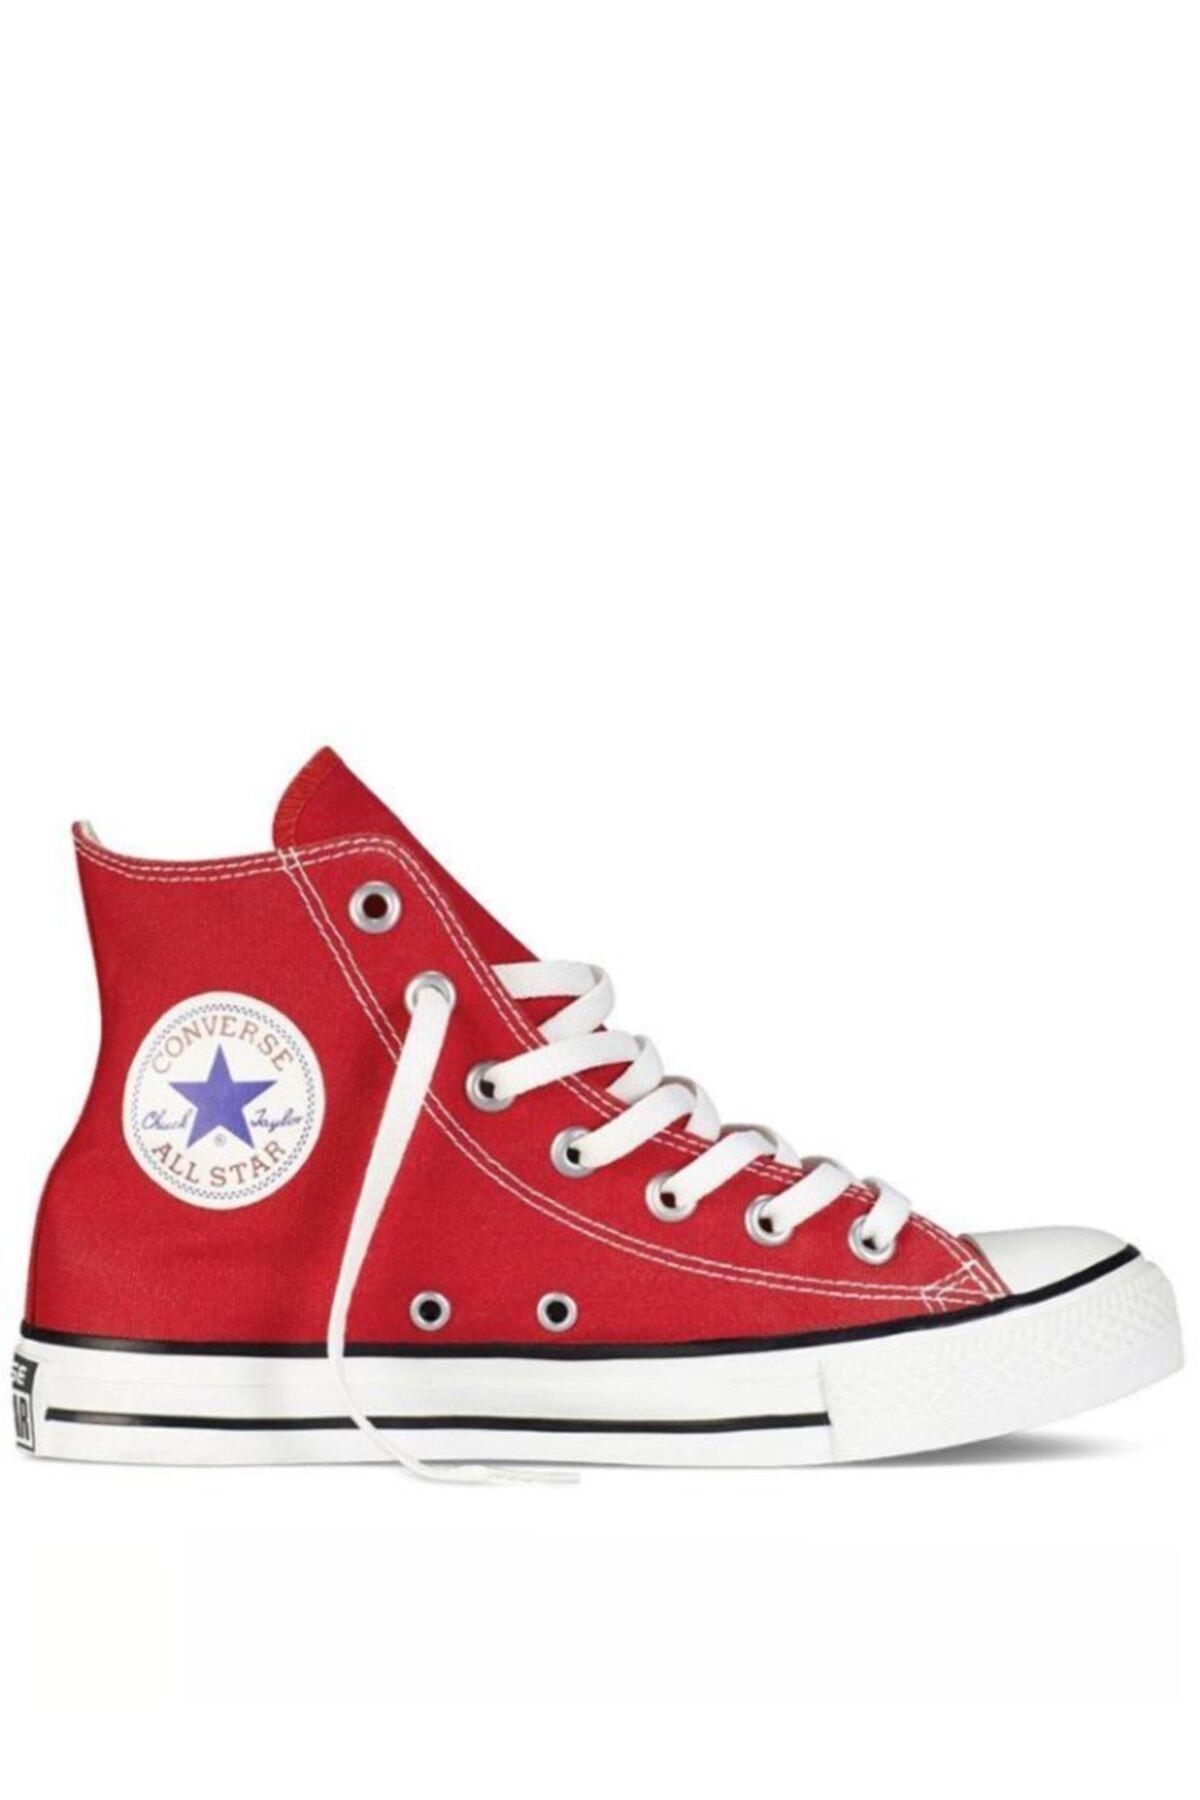 converse Chuck Taylor All Star Hi Unisex Kırmızı Uzun (M9621c) 1